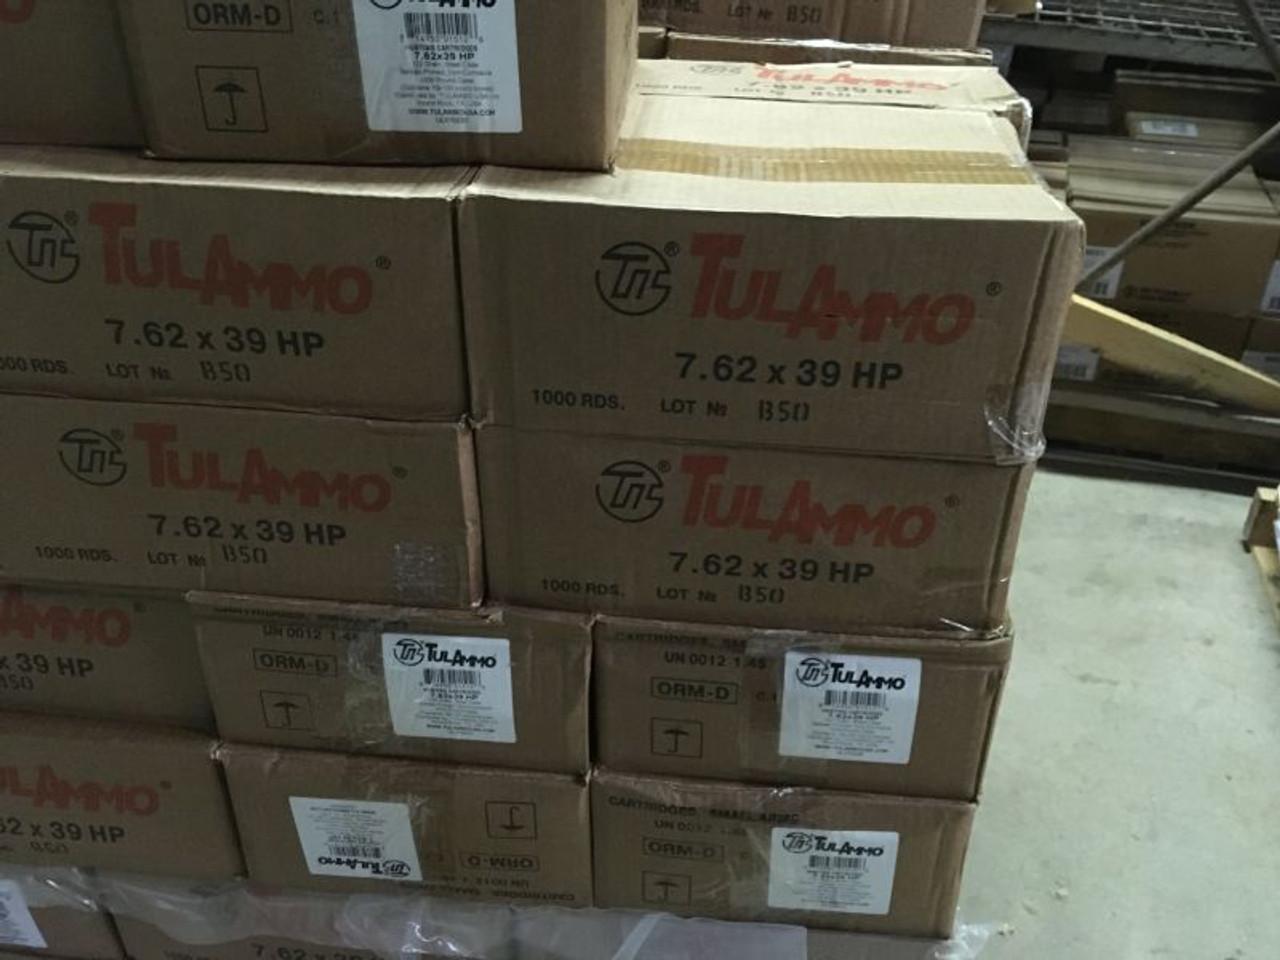 TulAmmo 7.62x39 mm 122 gr HP Steel Case - 1000 rounds